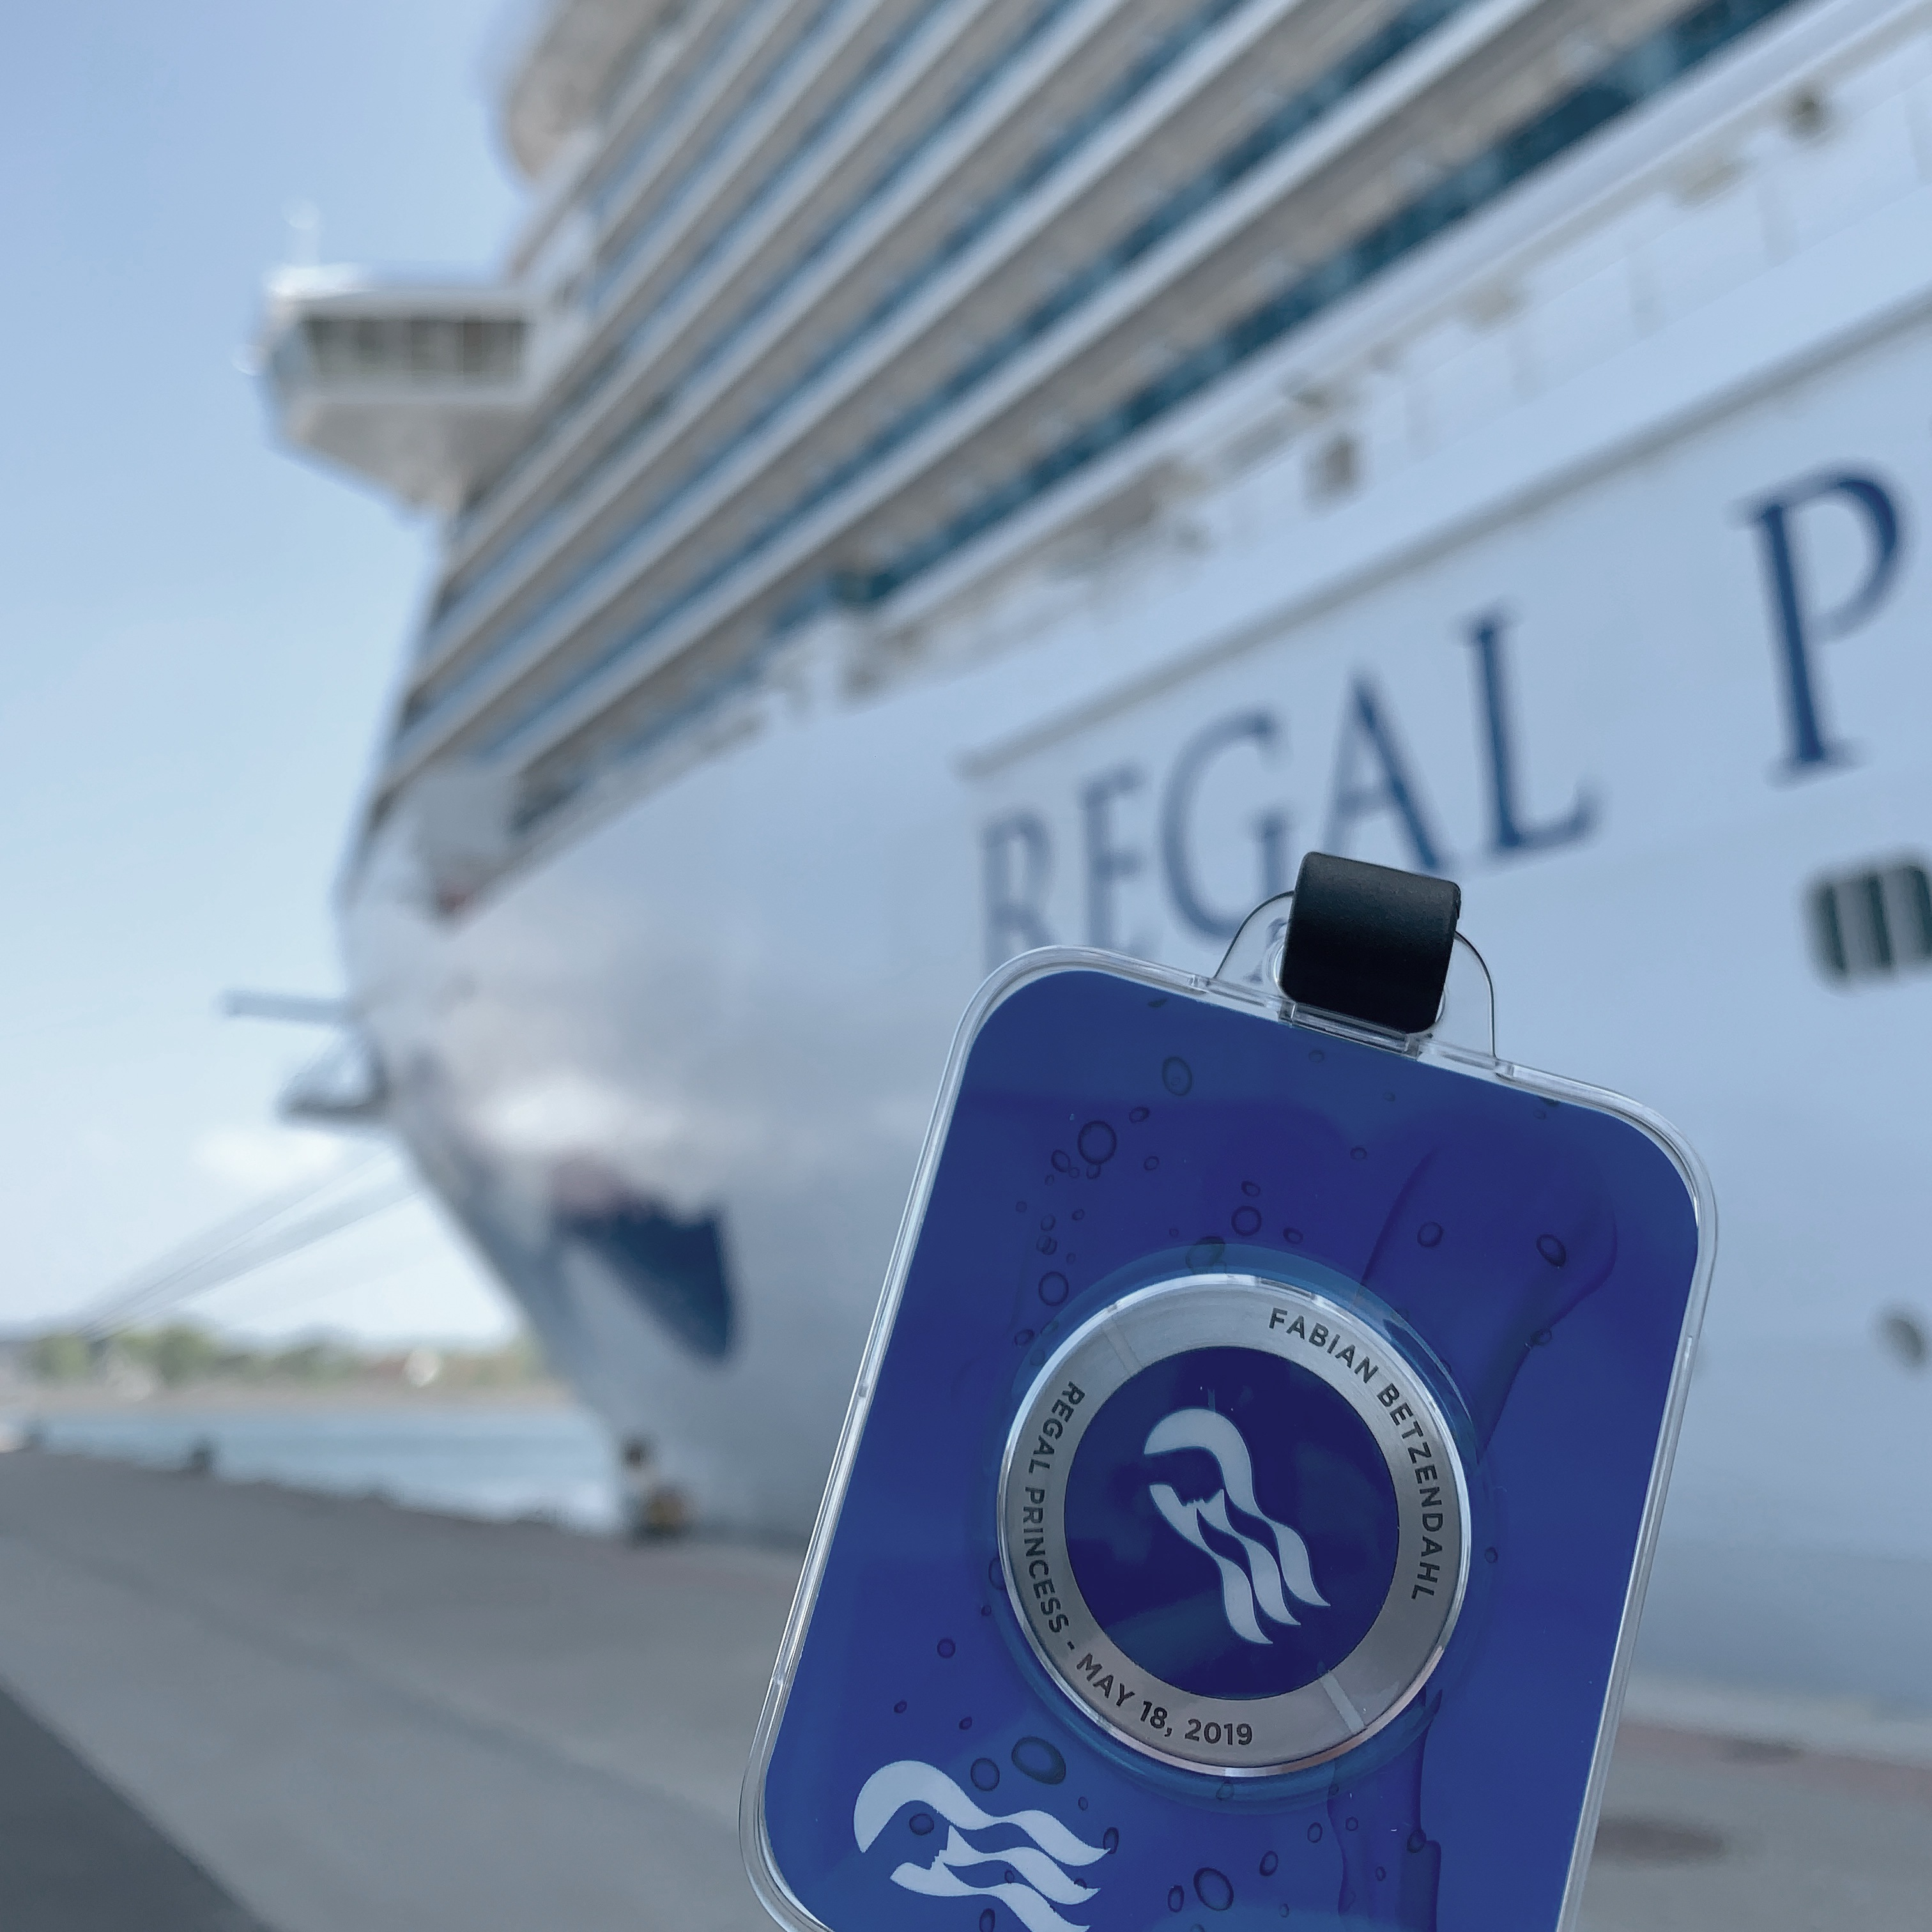 Fabian Betzendahl probiert das Ocean Medallion auf der Regal Princess aus